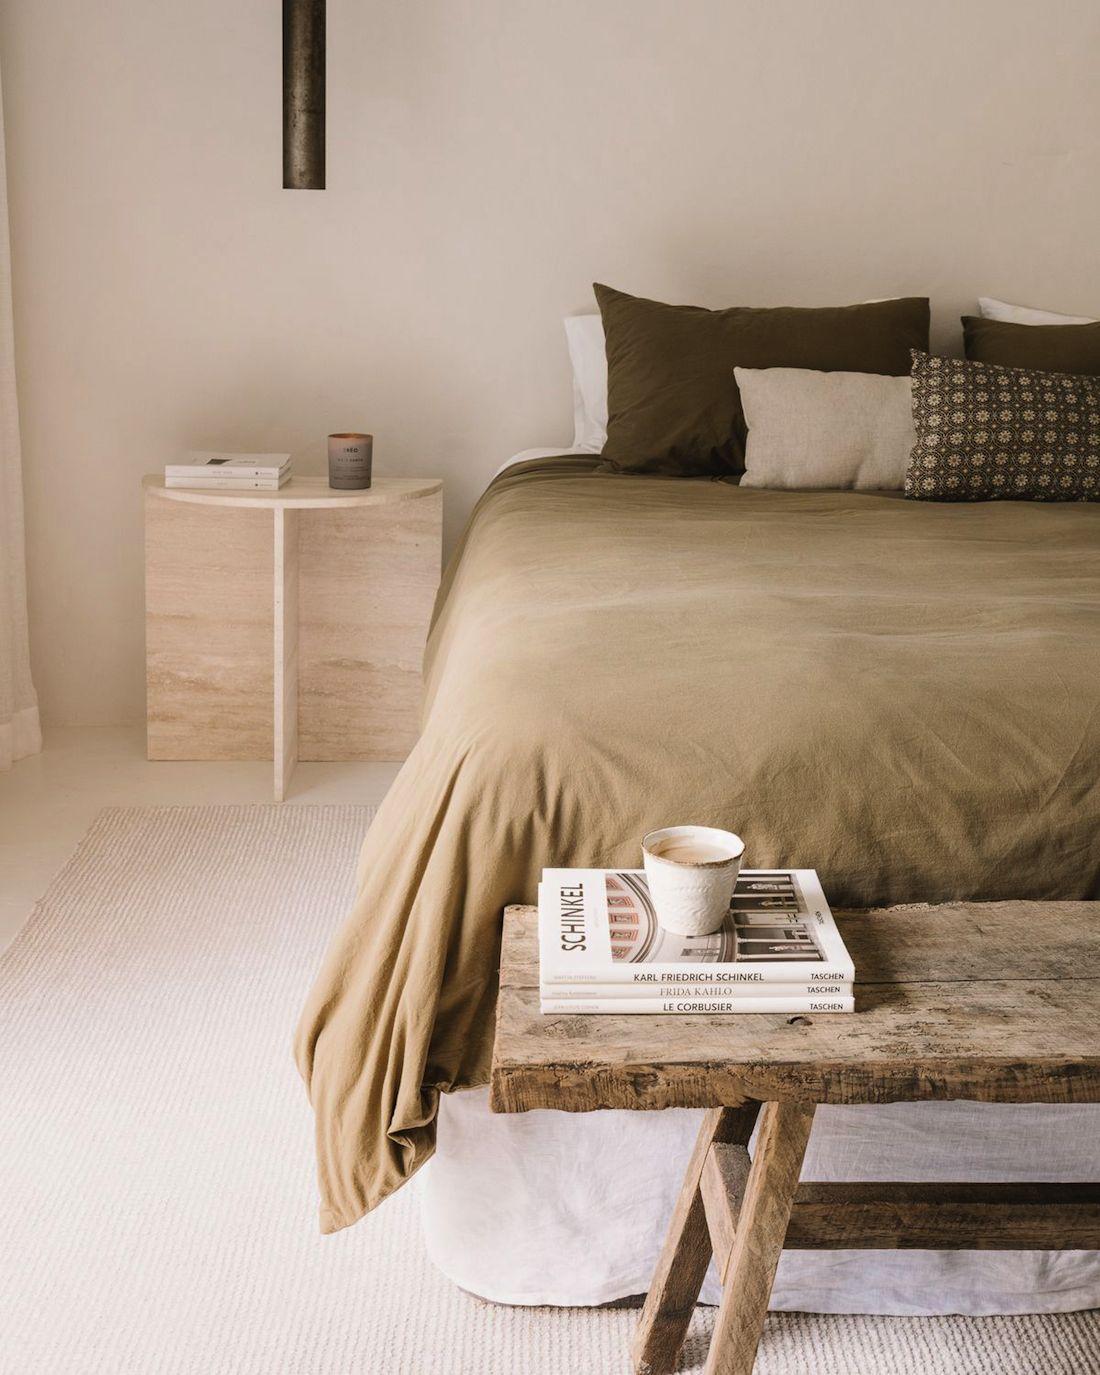 Rustic natural bedroom